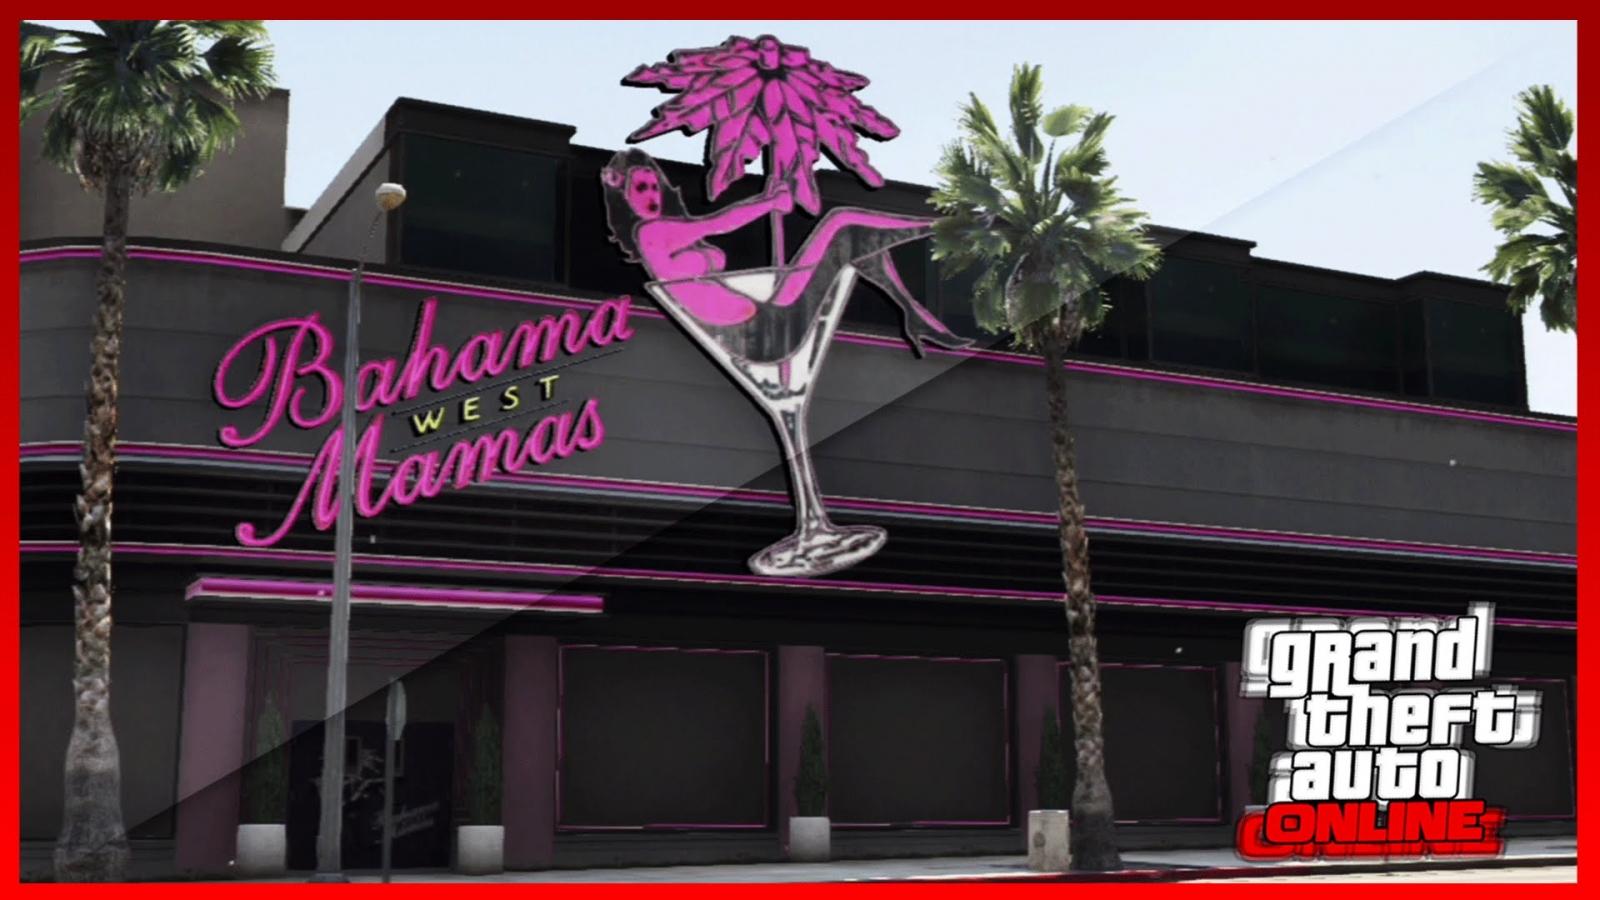 GTA 5 Online secret night club location: How to get inside [Tutorial]